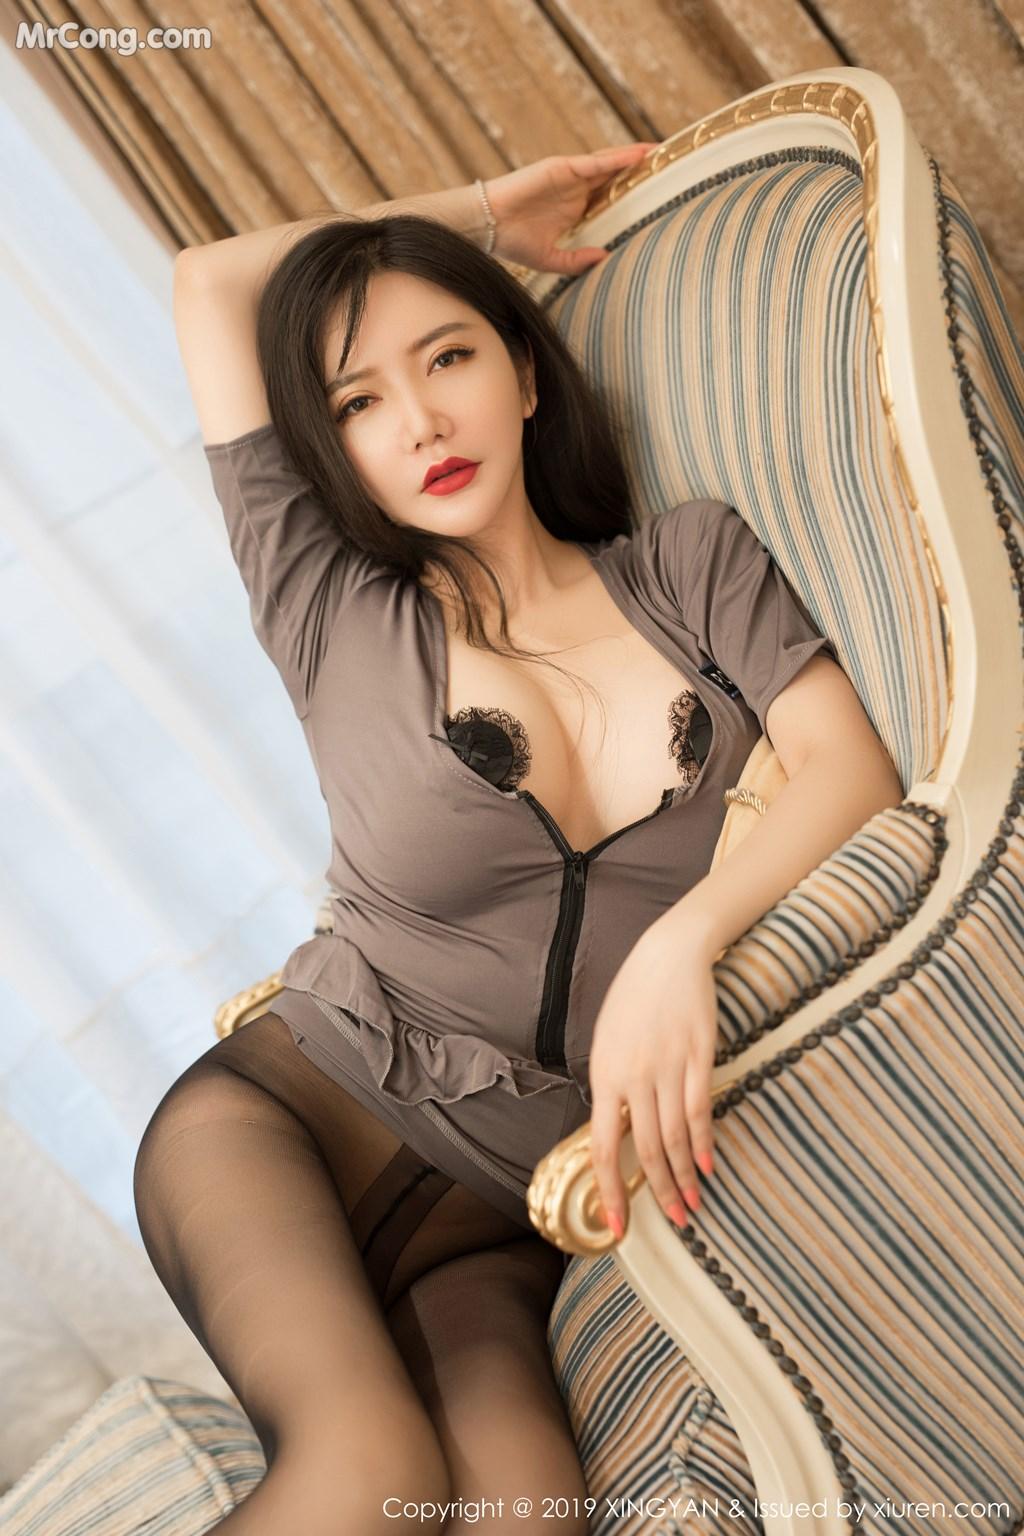 Image XingYan-Vol.123-MrCong.com-010 in post XingYan Vol.123: 心妍小公主 (47 ảnh)